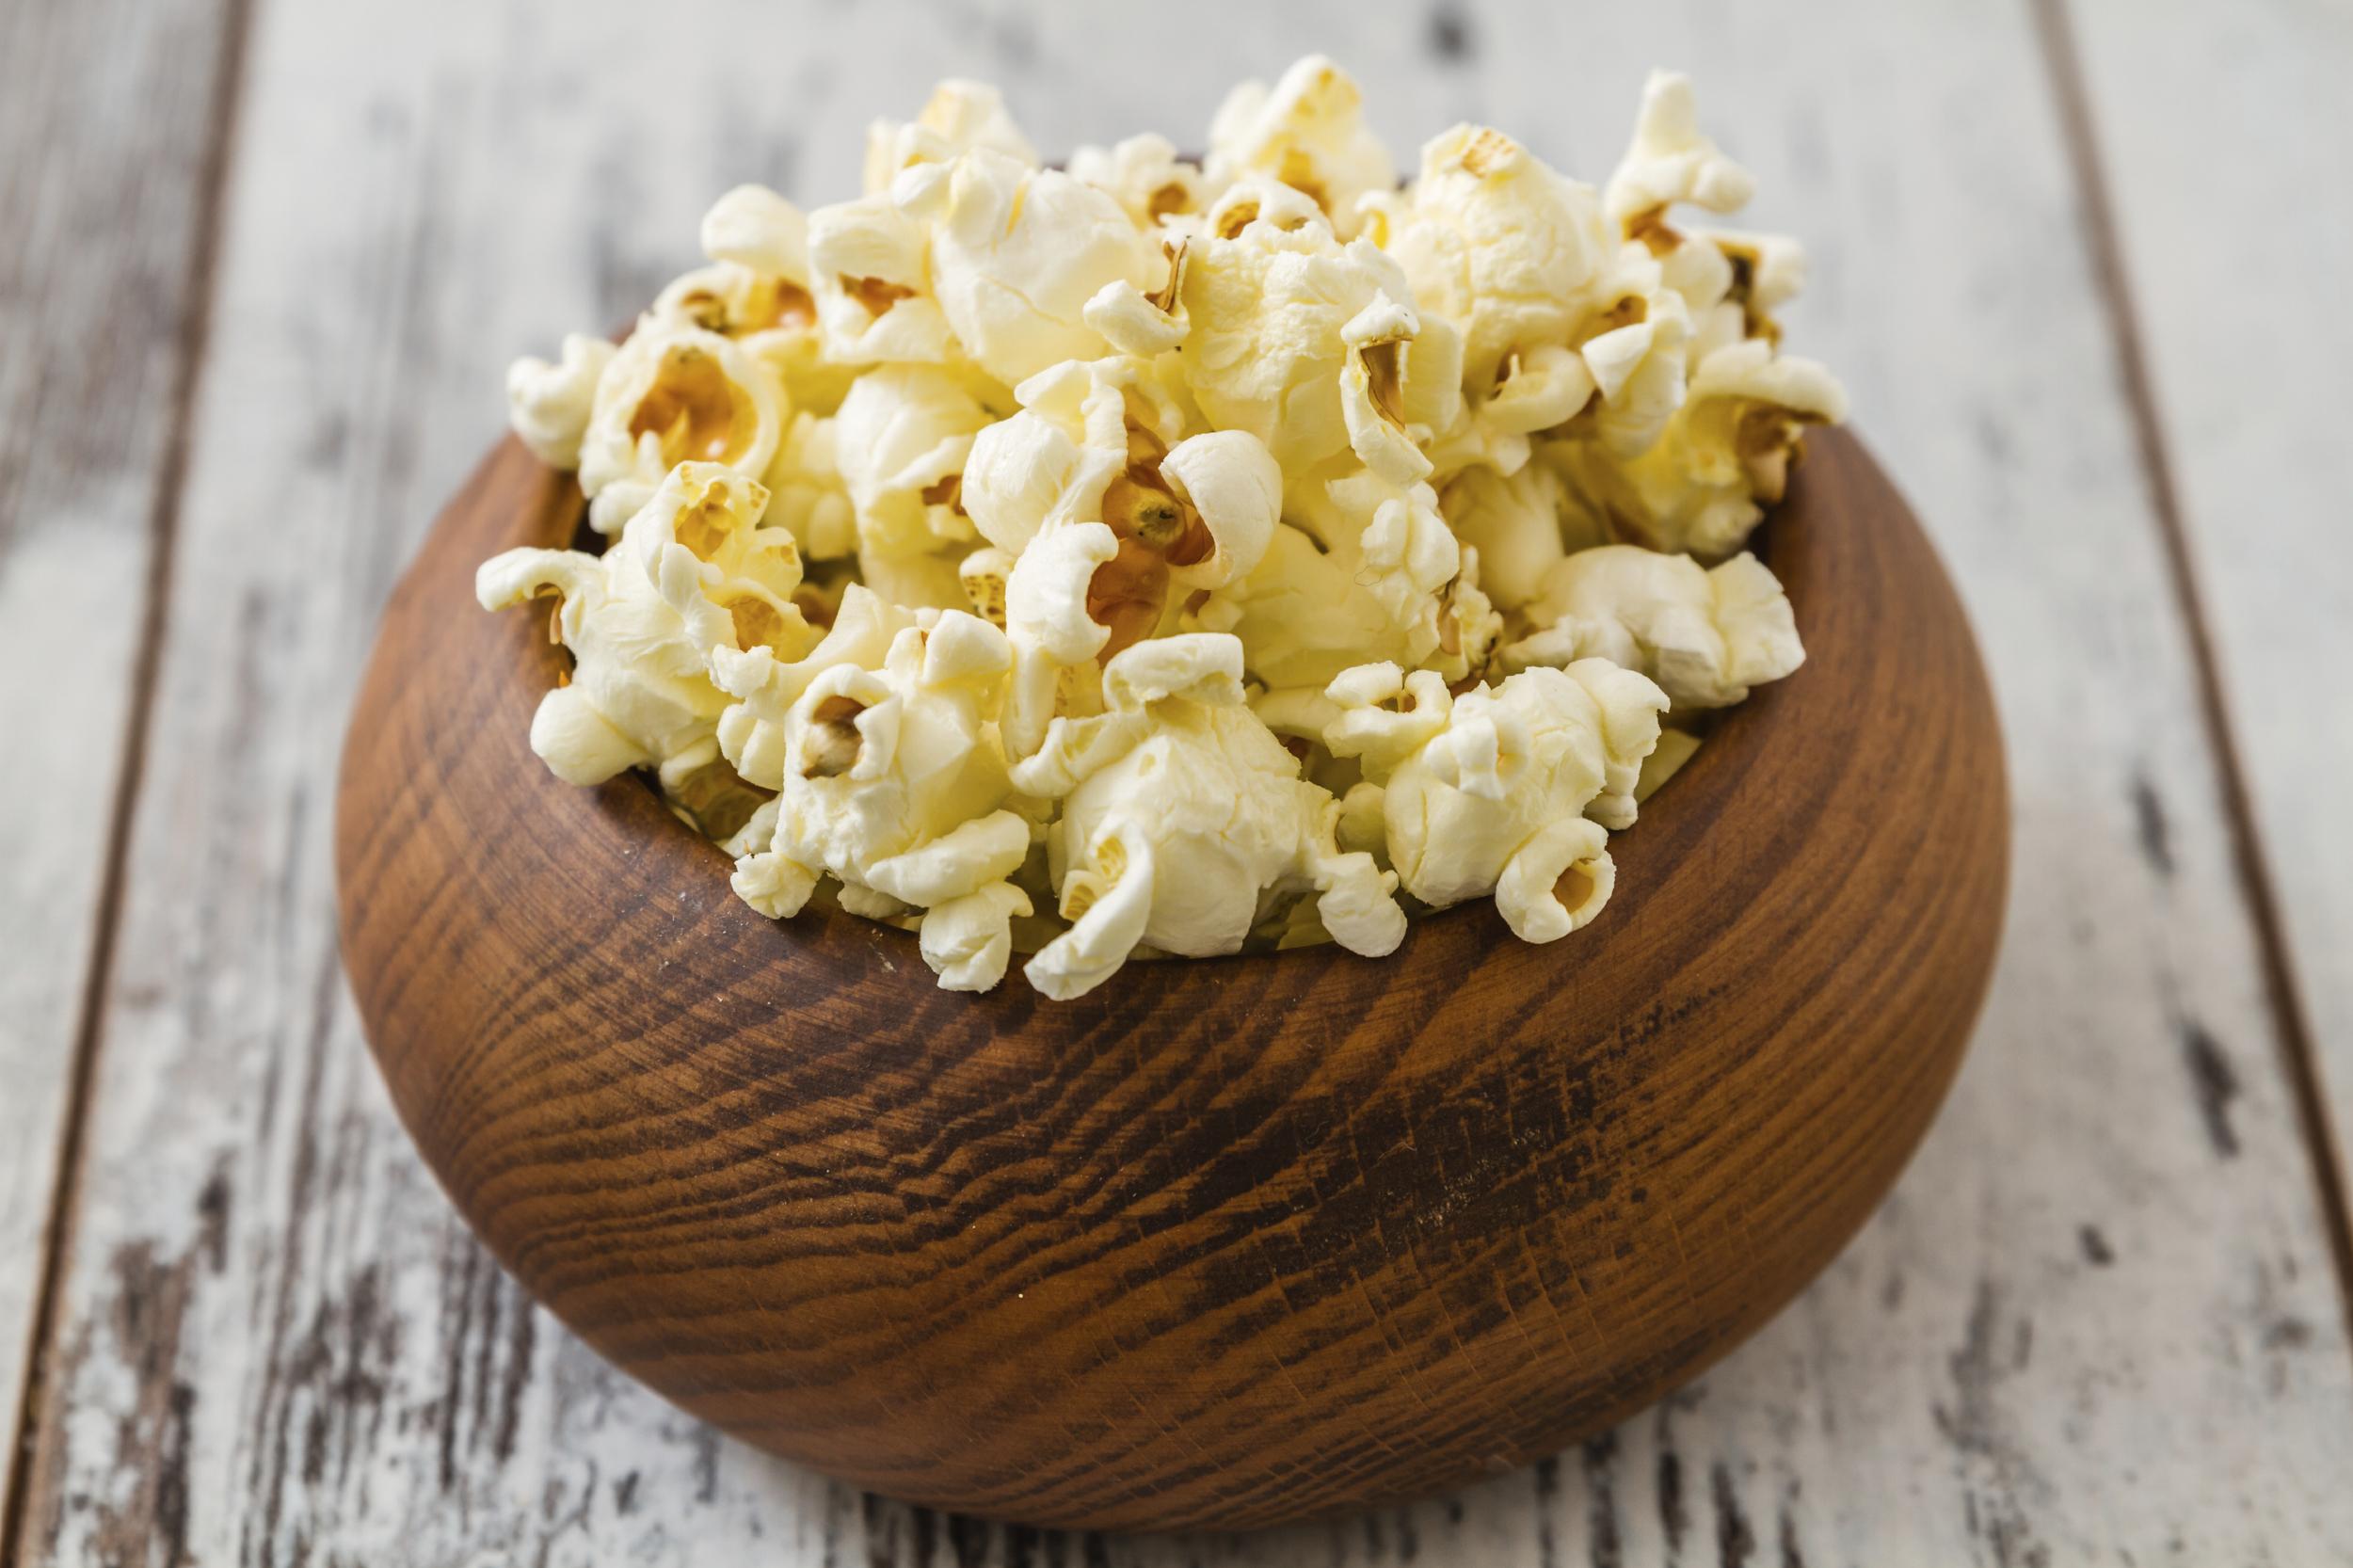 Food Popcorn 53667278_Large.jpg